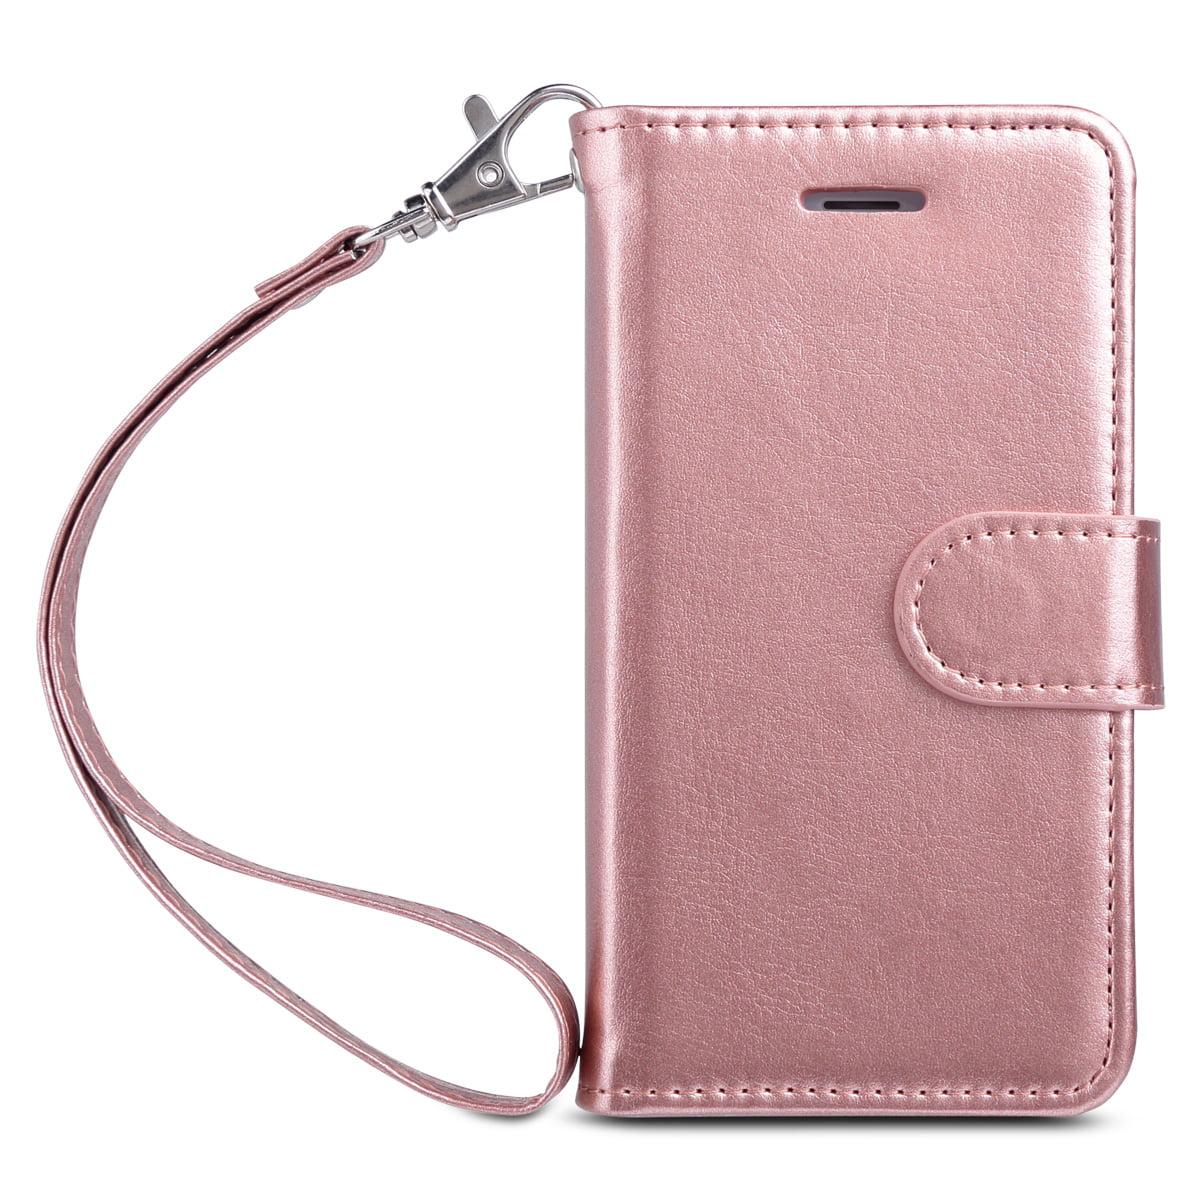 iPhone 5s Case, ULAK iPhone SE Case Wallet, Premium [Multi- Card Slots ] Magnetic Leather Hybrid Flip Wallet Case Cover for Apple iPhone 5S 5 SE